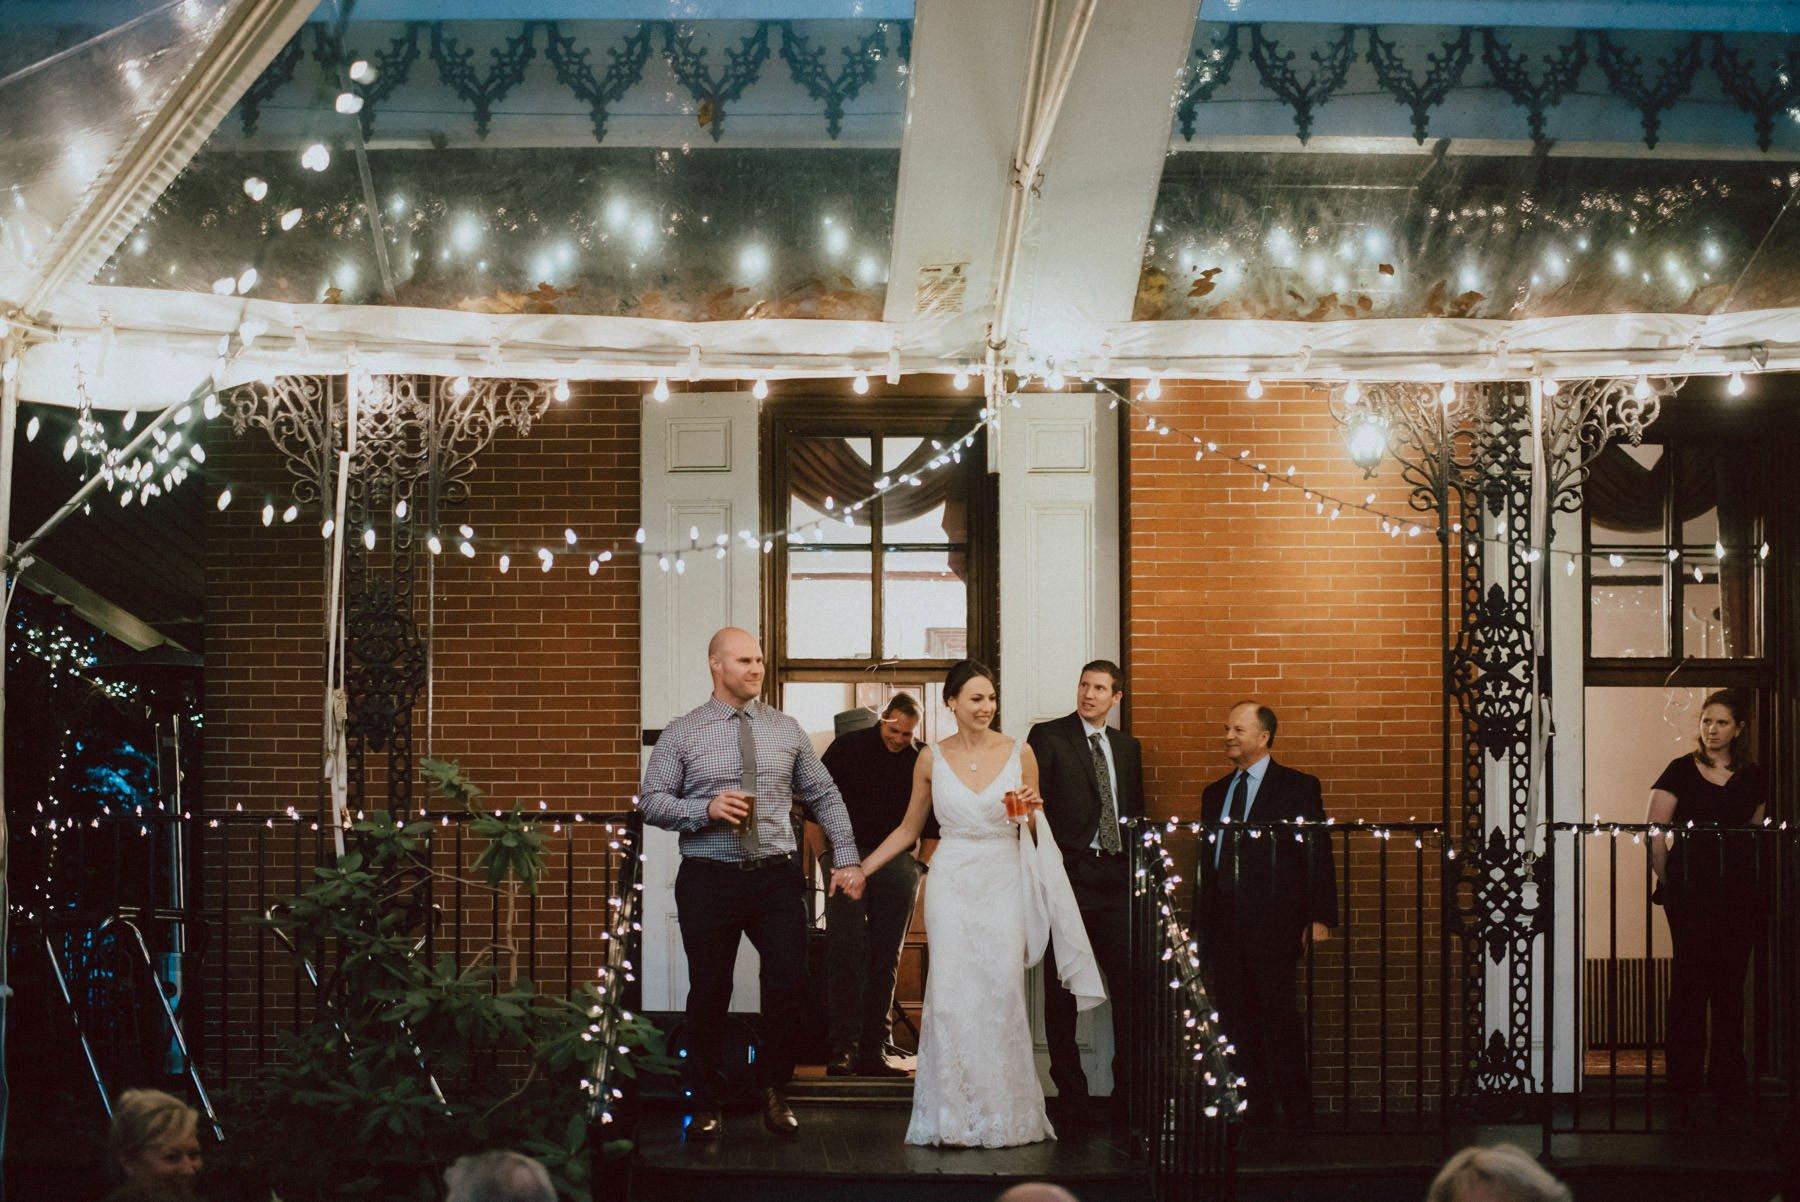 faunbrook-bed-and-breakfast-wedding-142.jpg